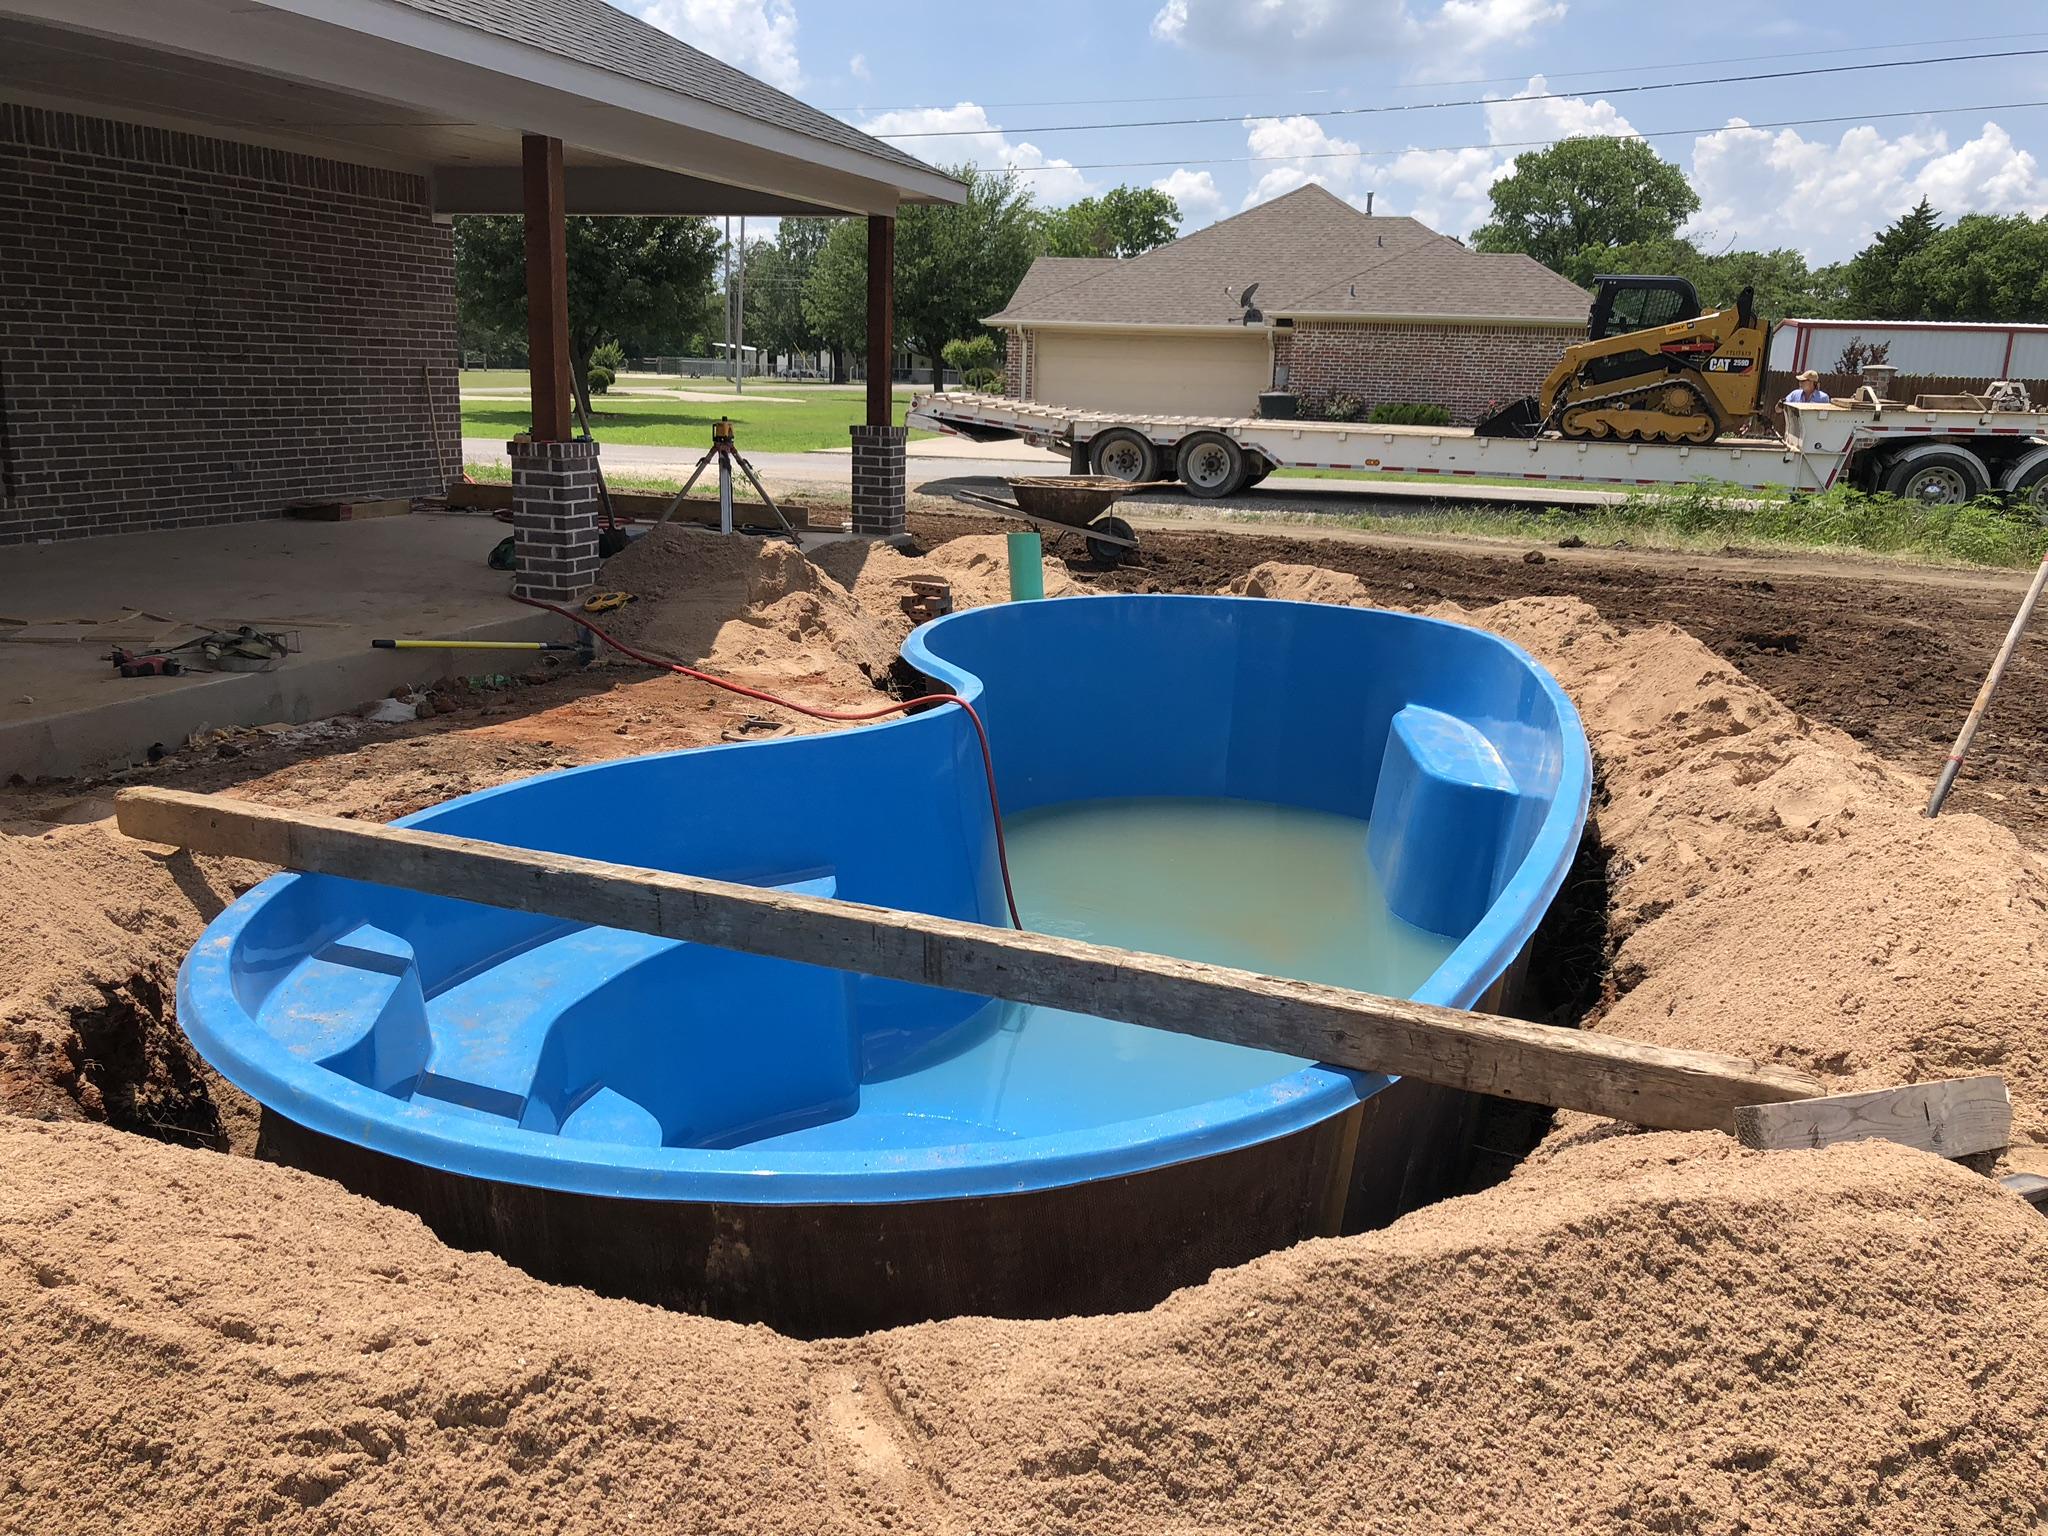 The Seaside Fiberglass Pool